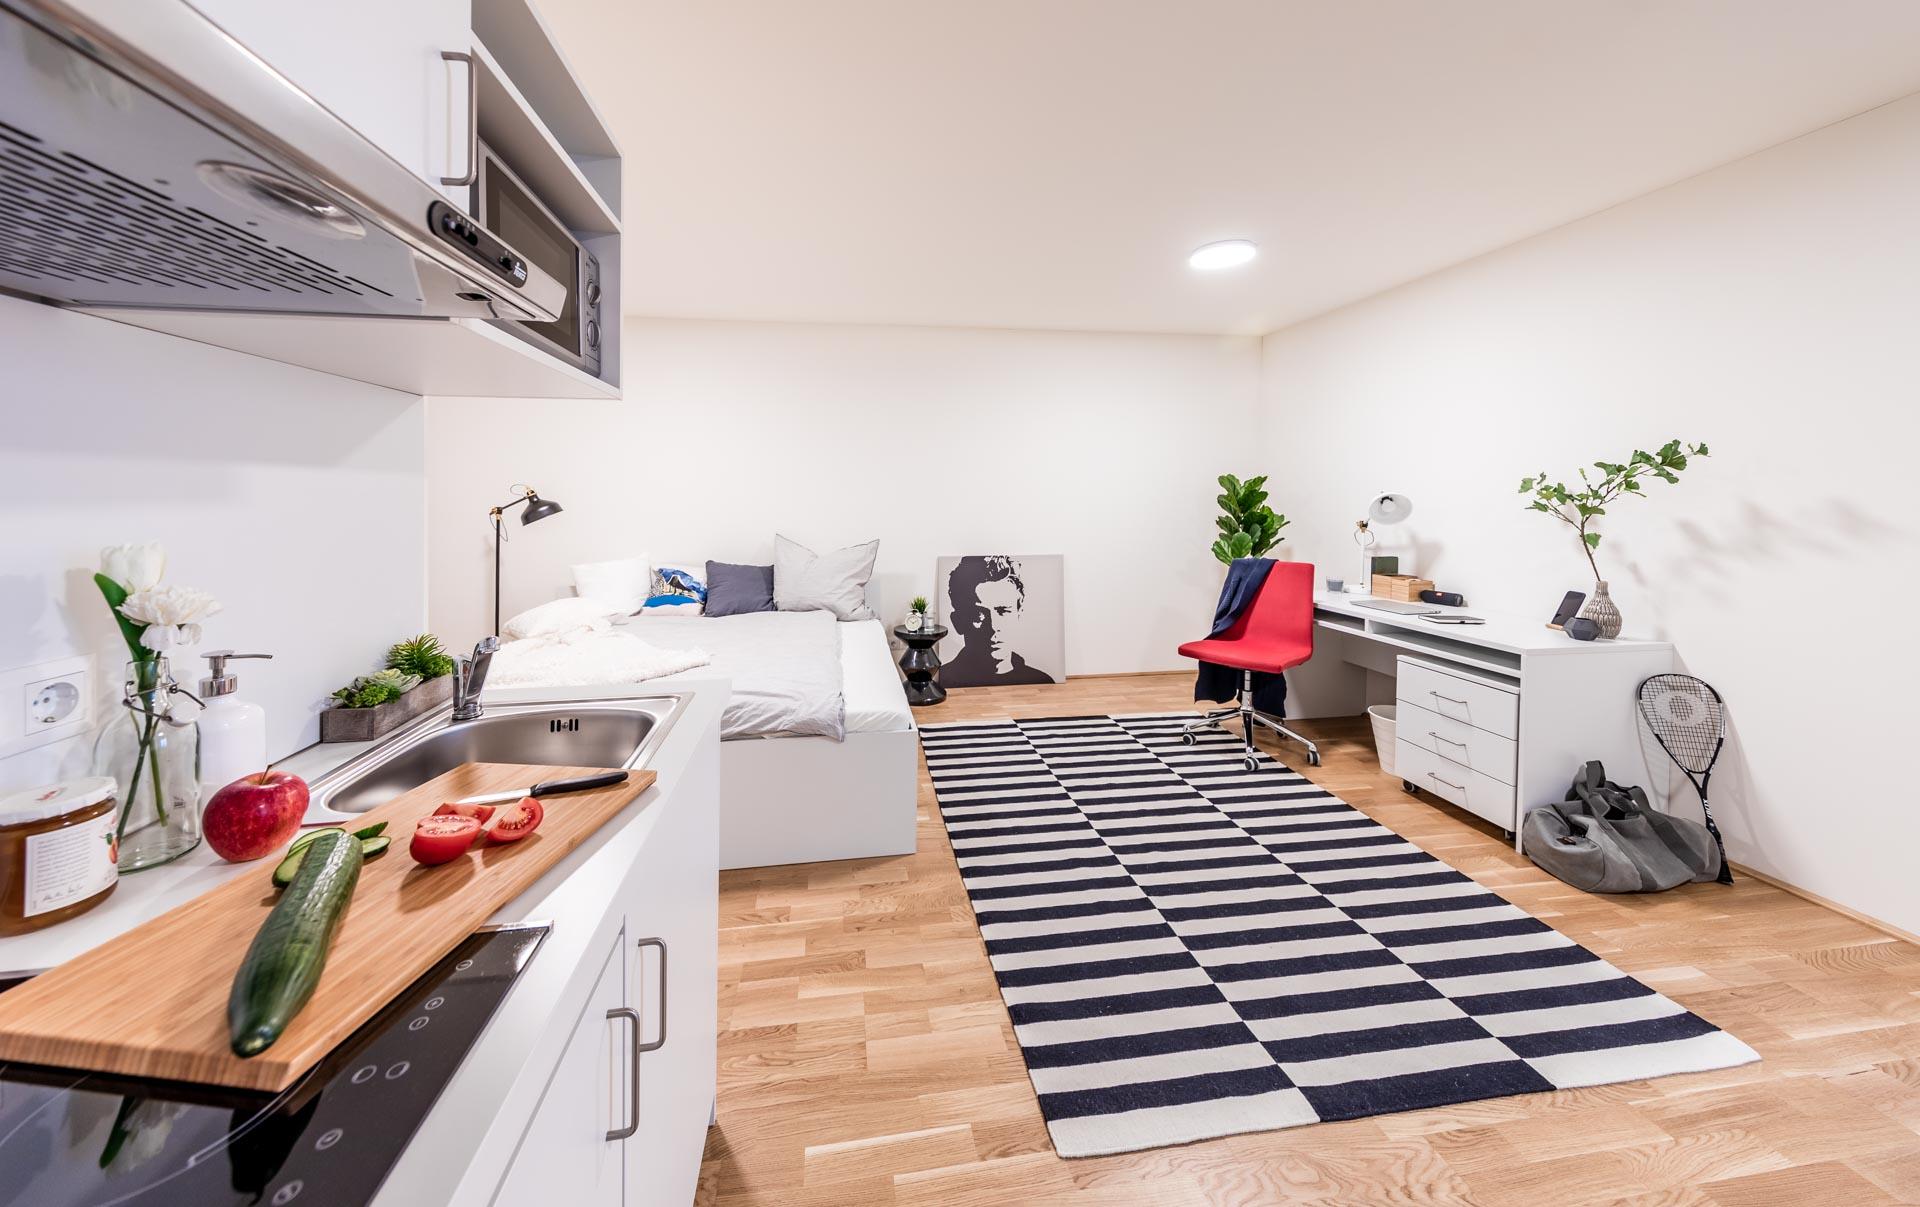 THE FIZZ Double Apartment - Kochbereich